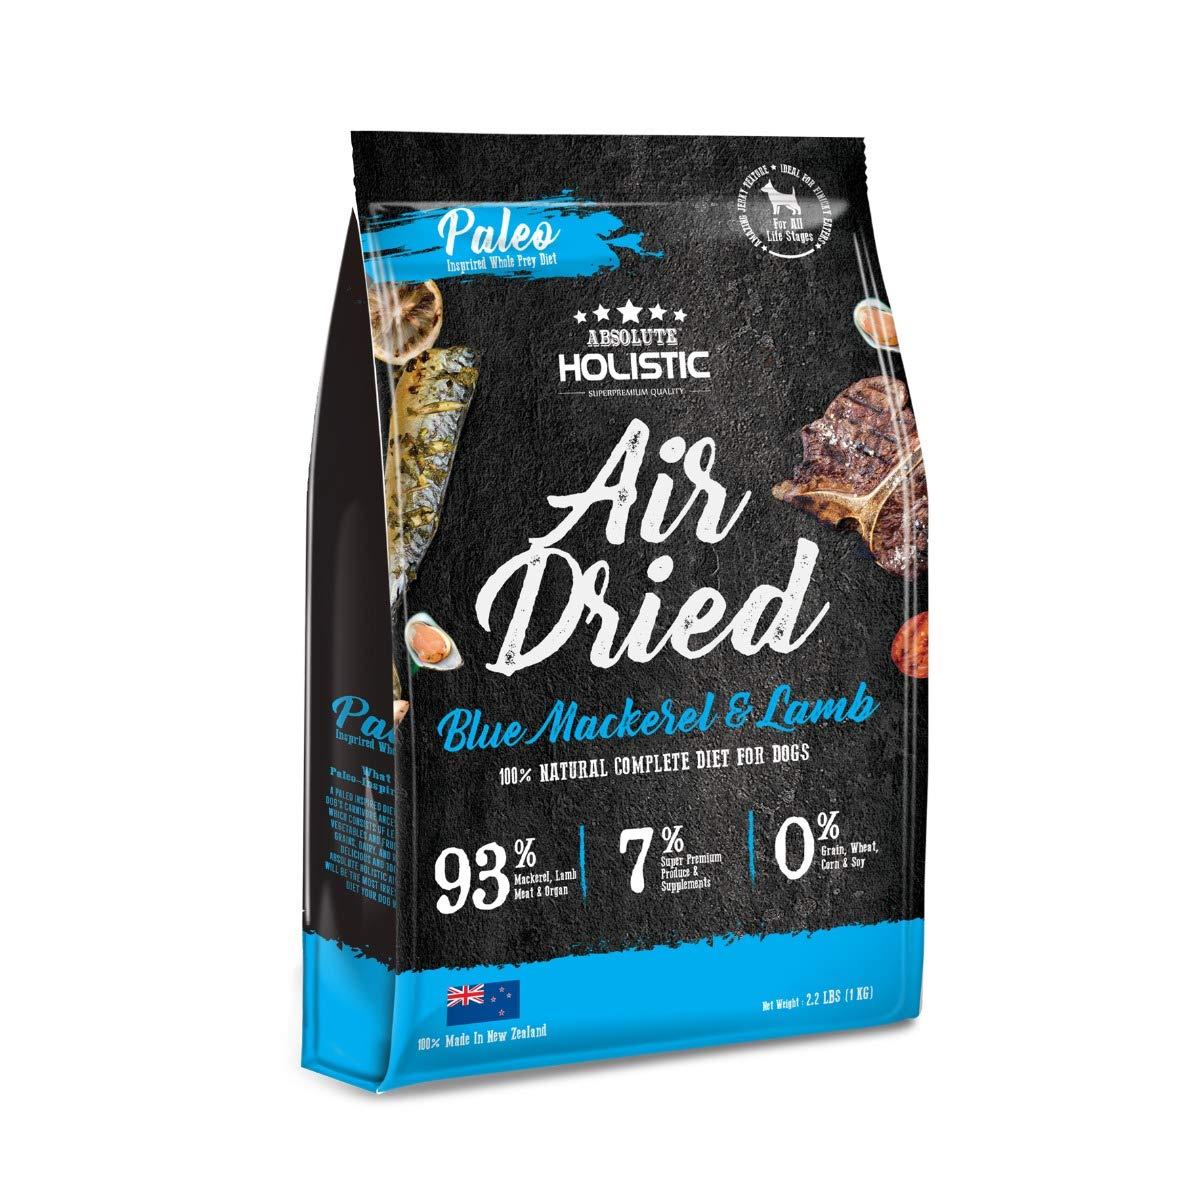 Absolute Holistic bluee Mackerel & Lamb Air Dried Dog Food 1kg